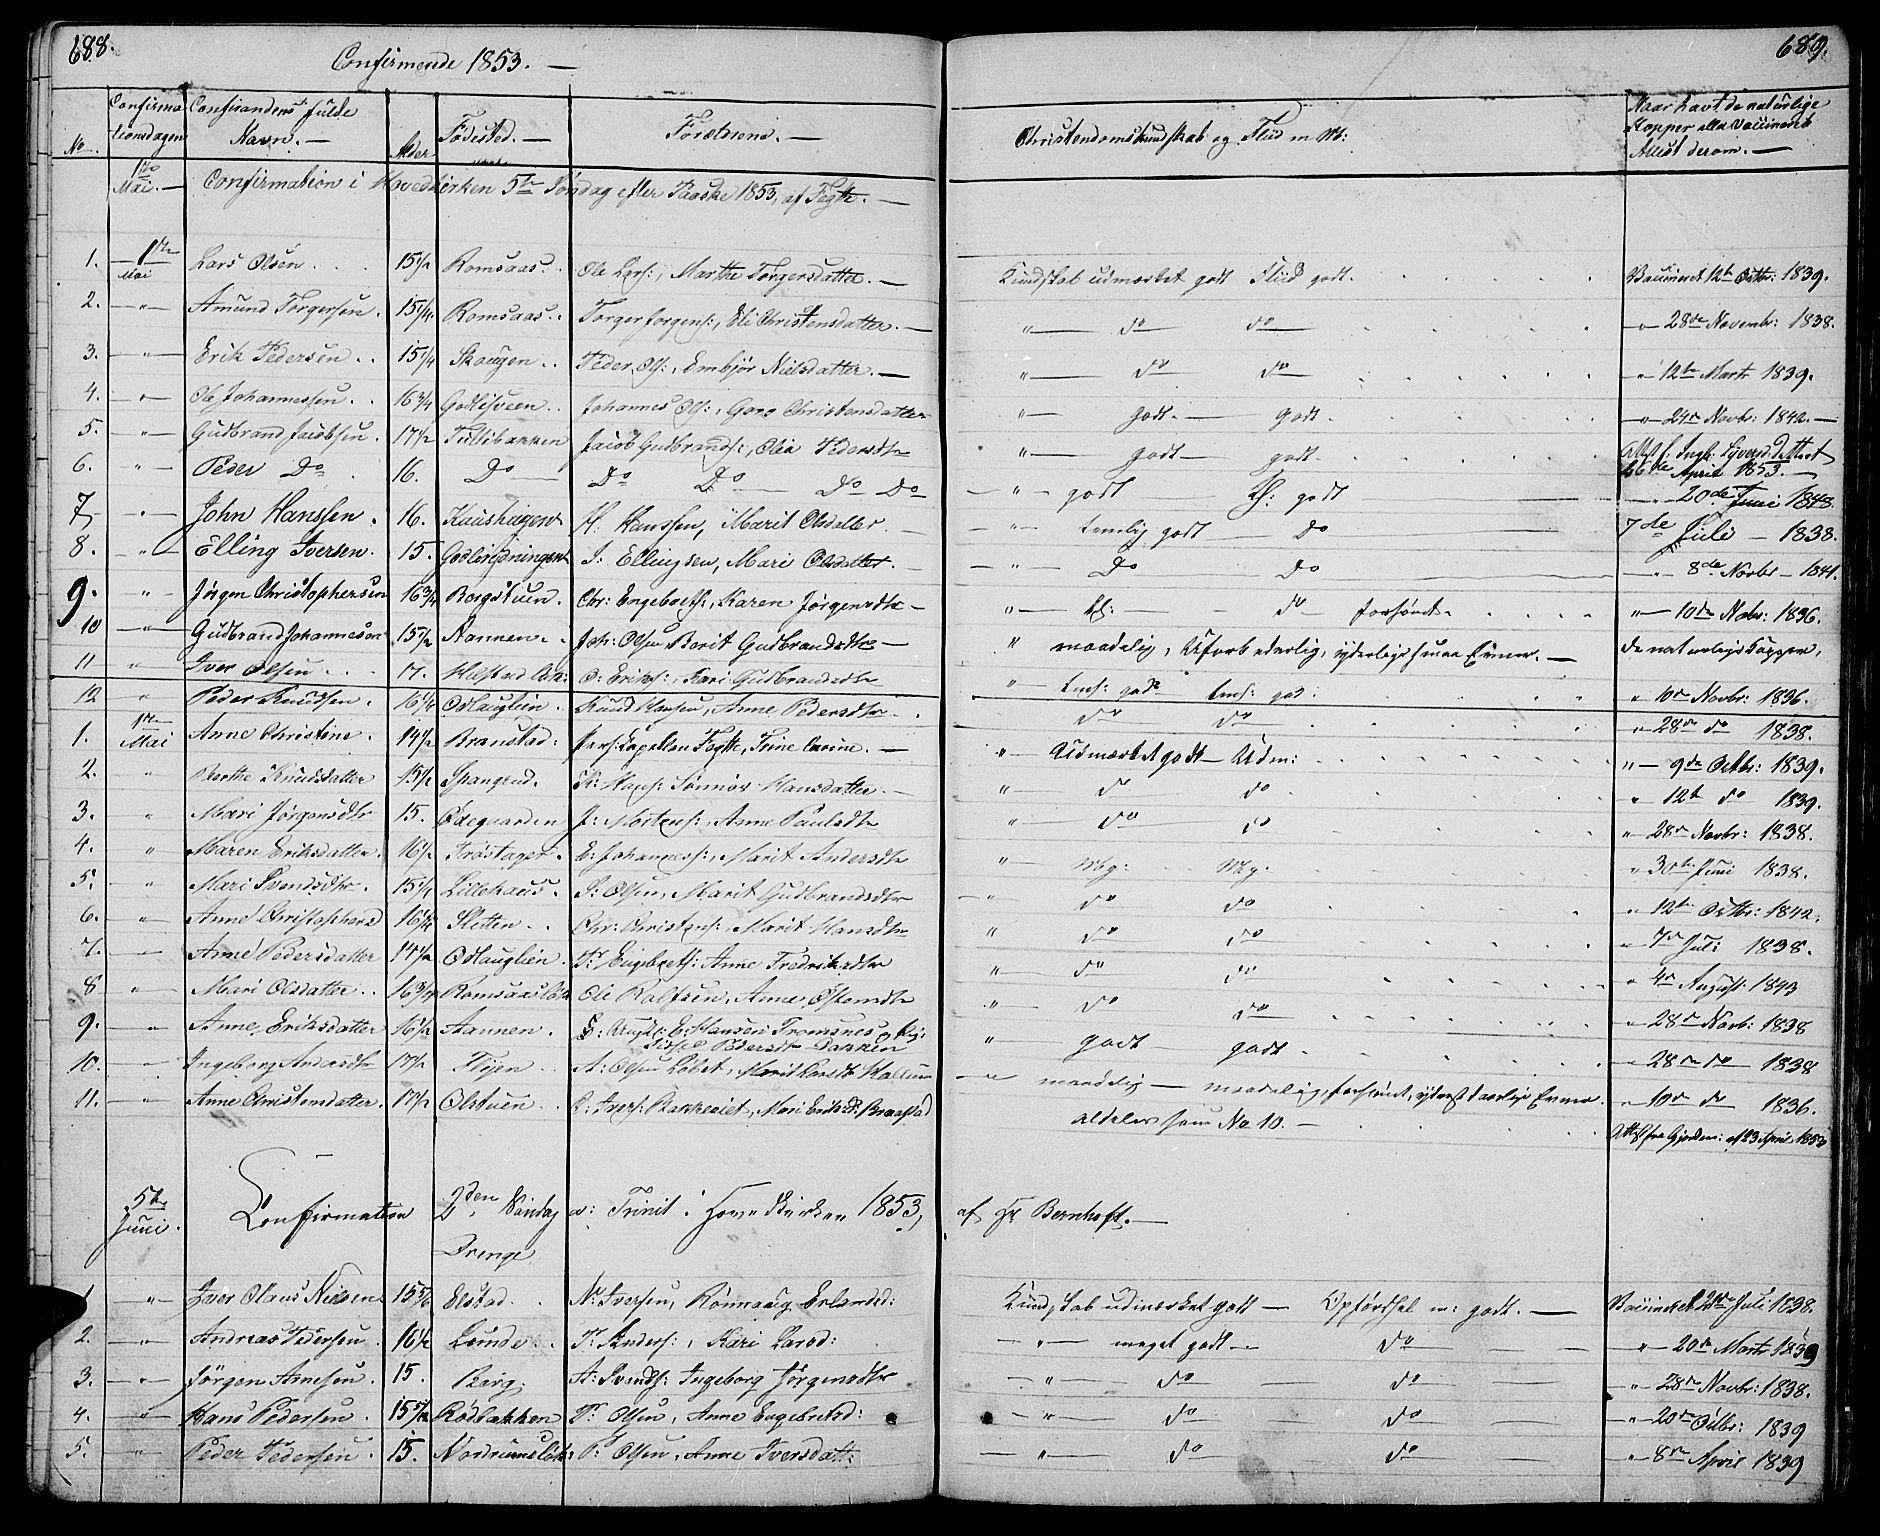 SAH, Ringebu prestekontor, Klokkerbok nr. 2, 1839-1853, s. 688-689